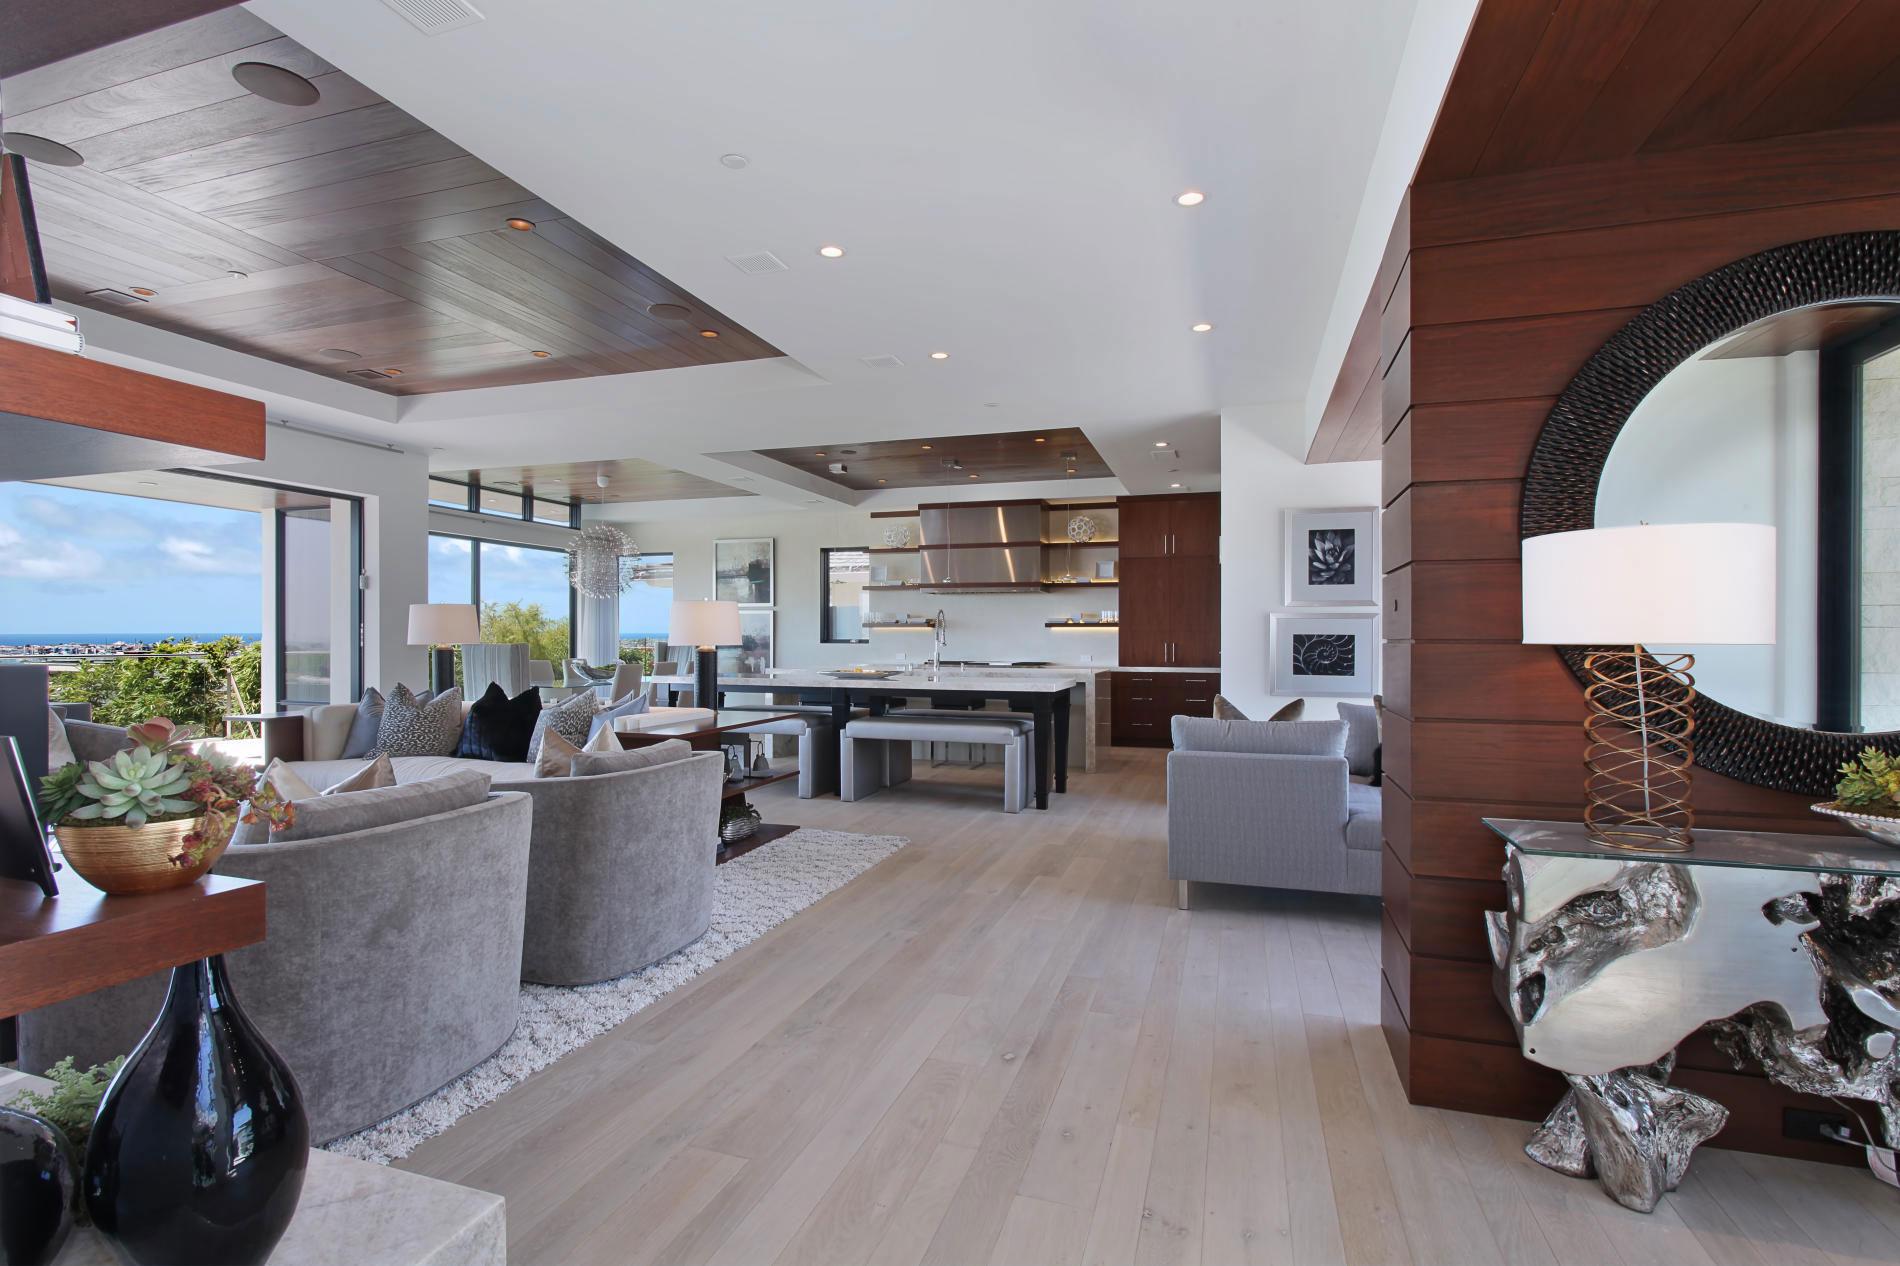 Open Plan Living, Sofas, Mirror, Table Lighting, Home in Corona del Mar, California